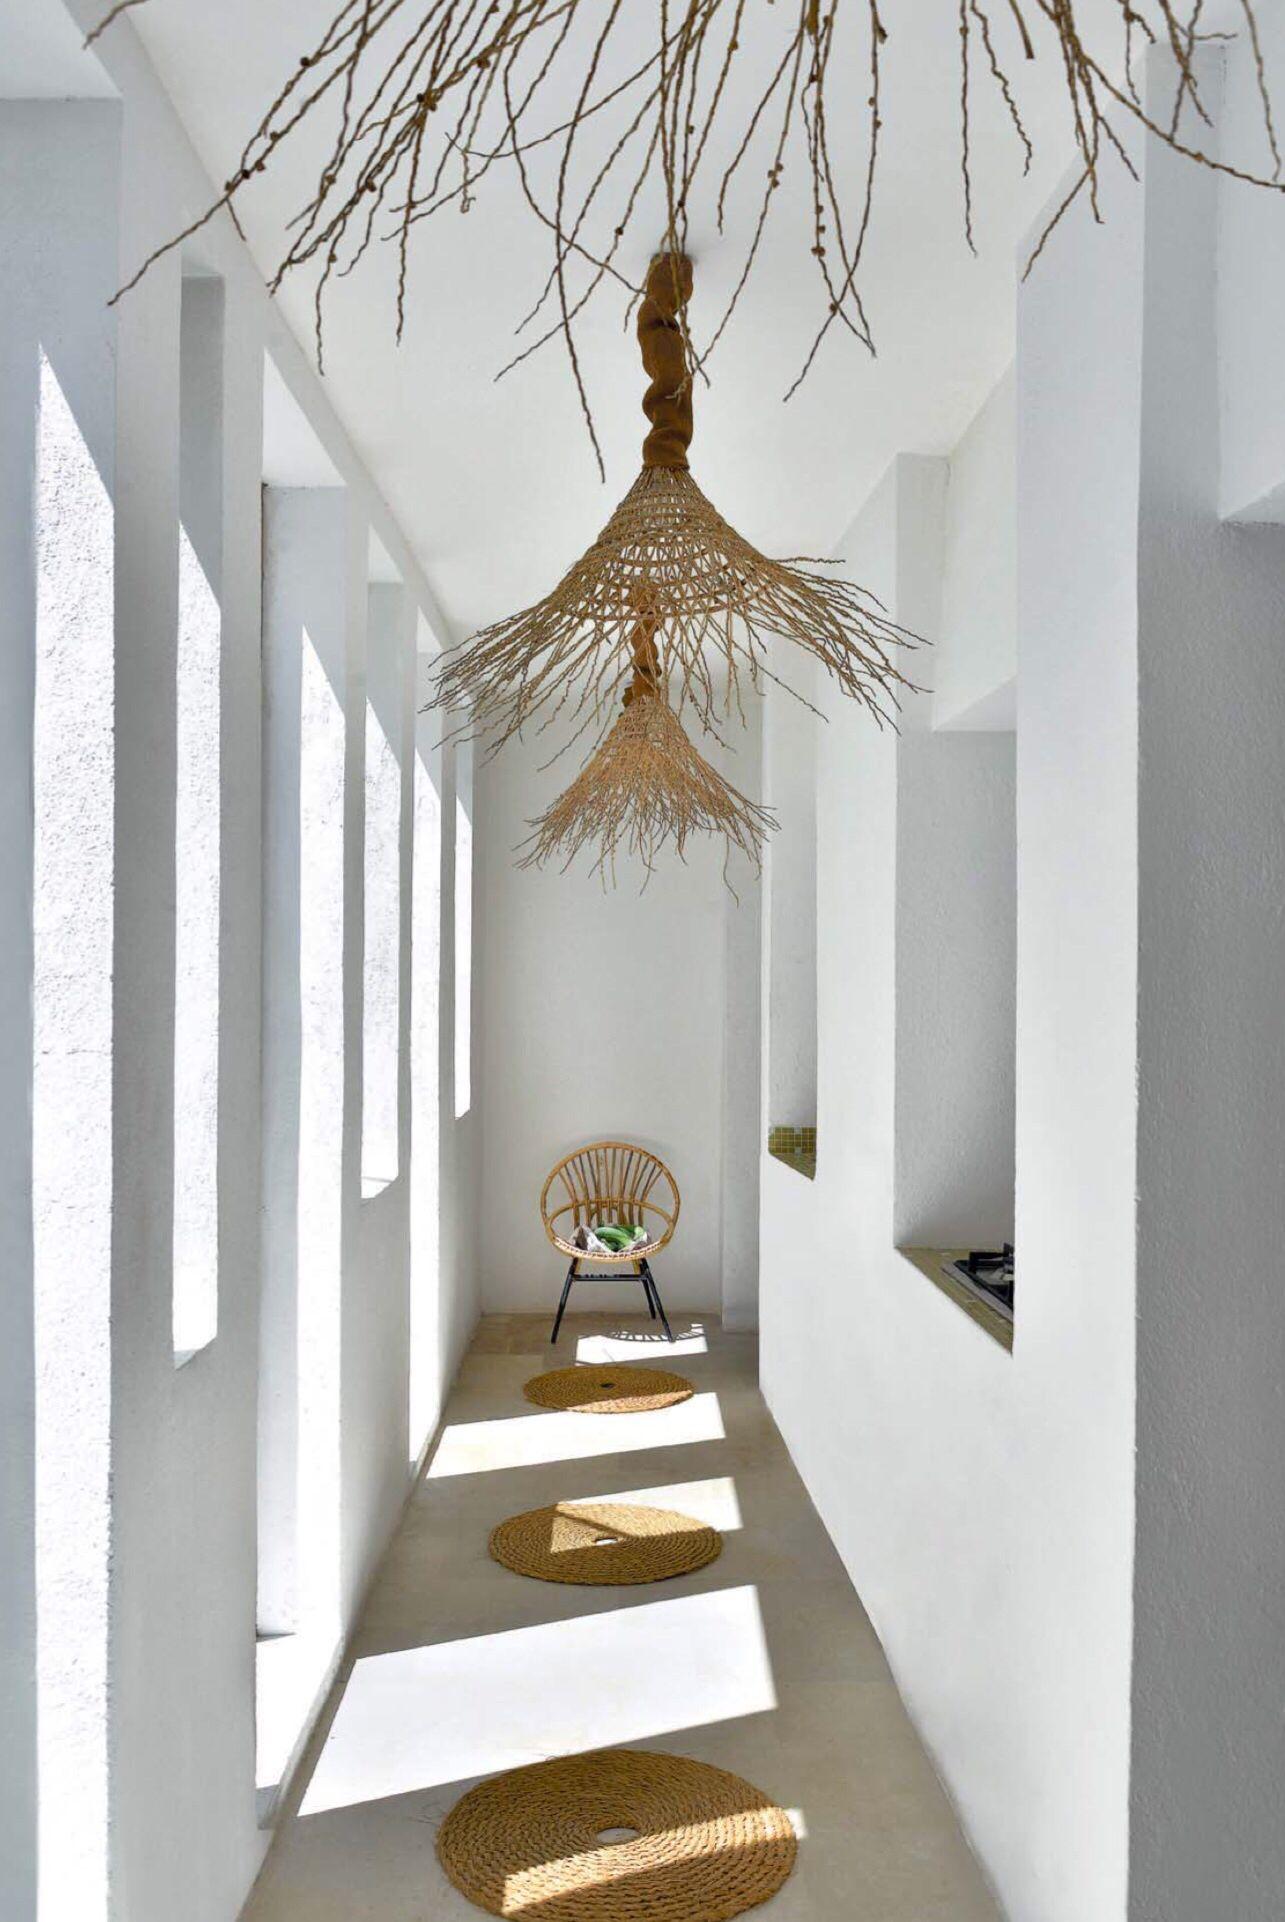 Summer House Interior Design Ideas From Berlin: Interior, Summer House, Home Interior Design